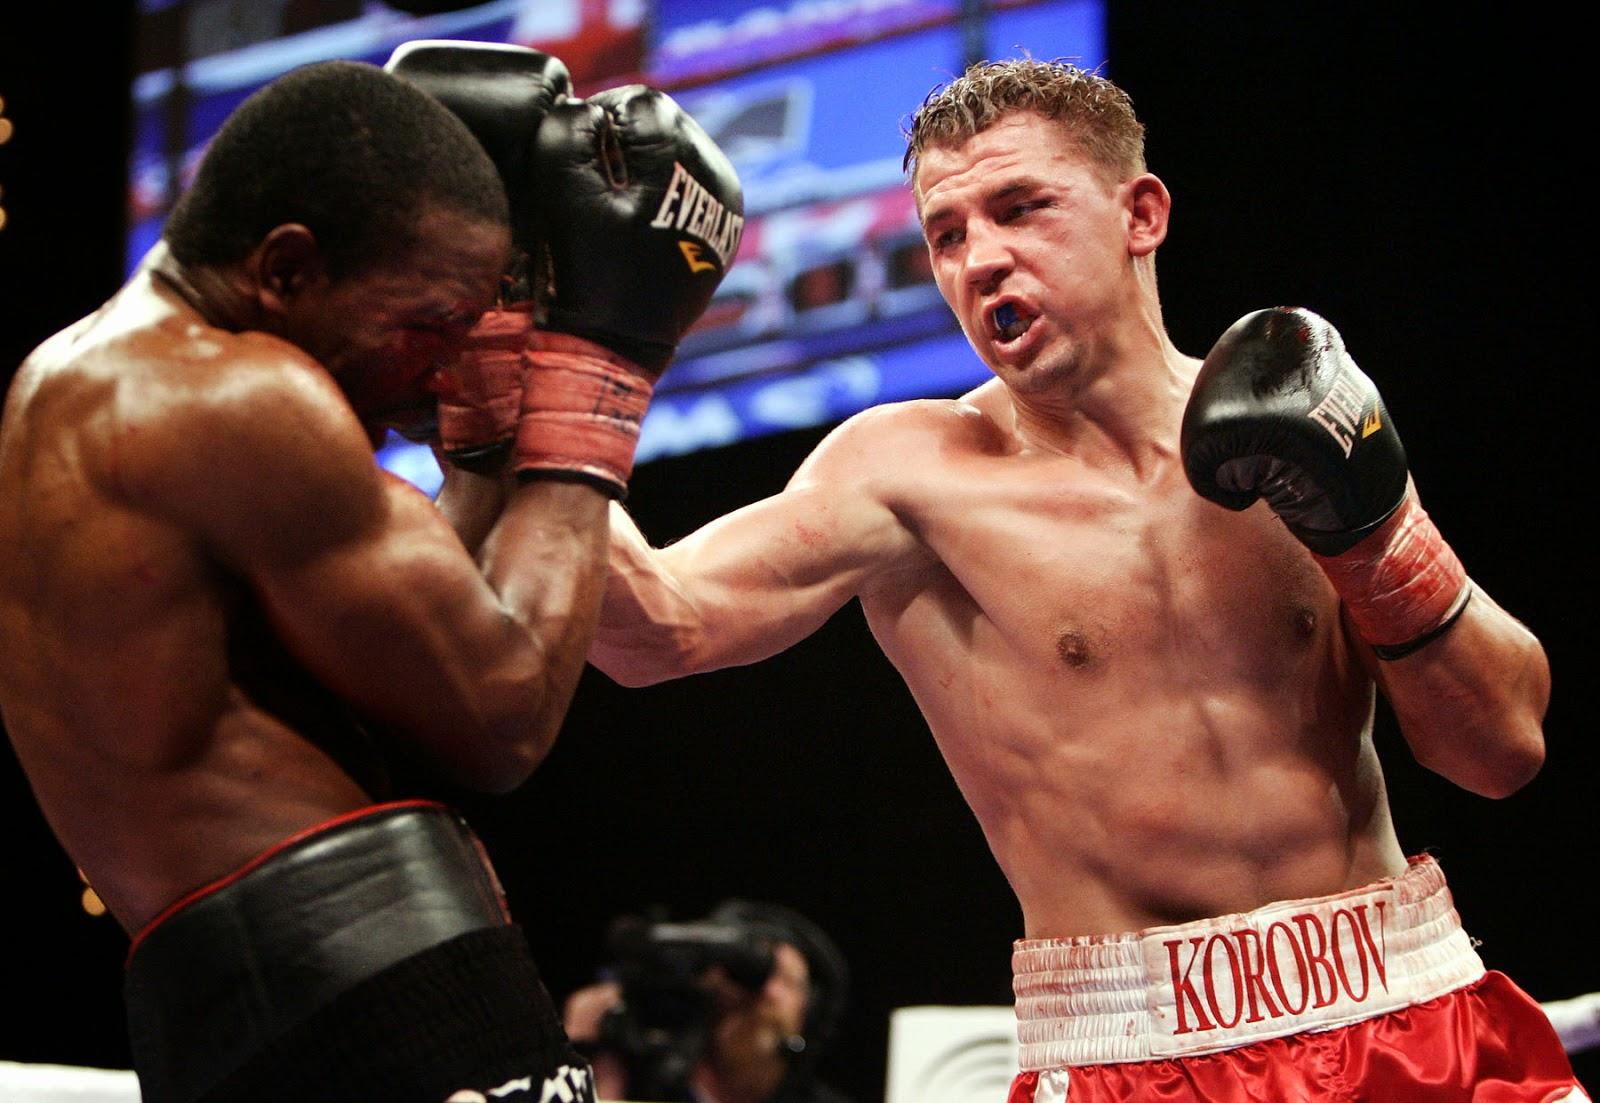 Matt Korobov vs. Jose Uzcategui live Boxing on 28 June 2014